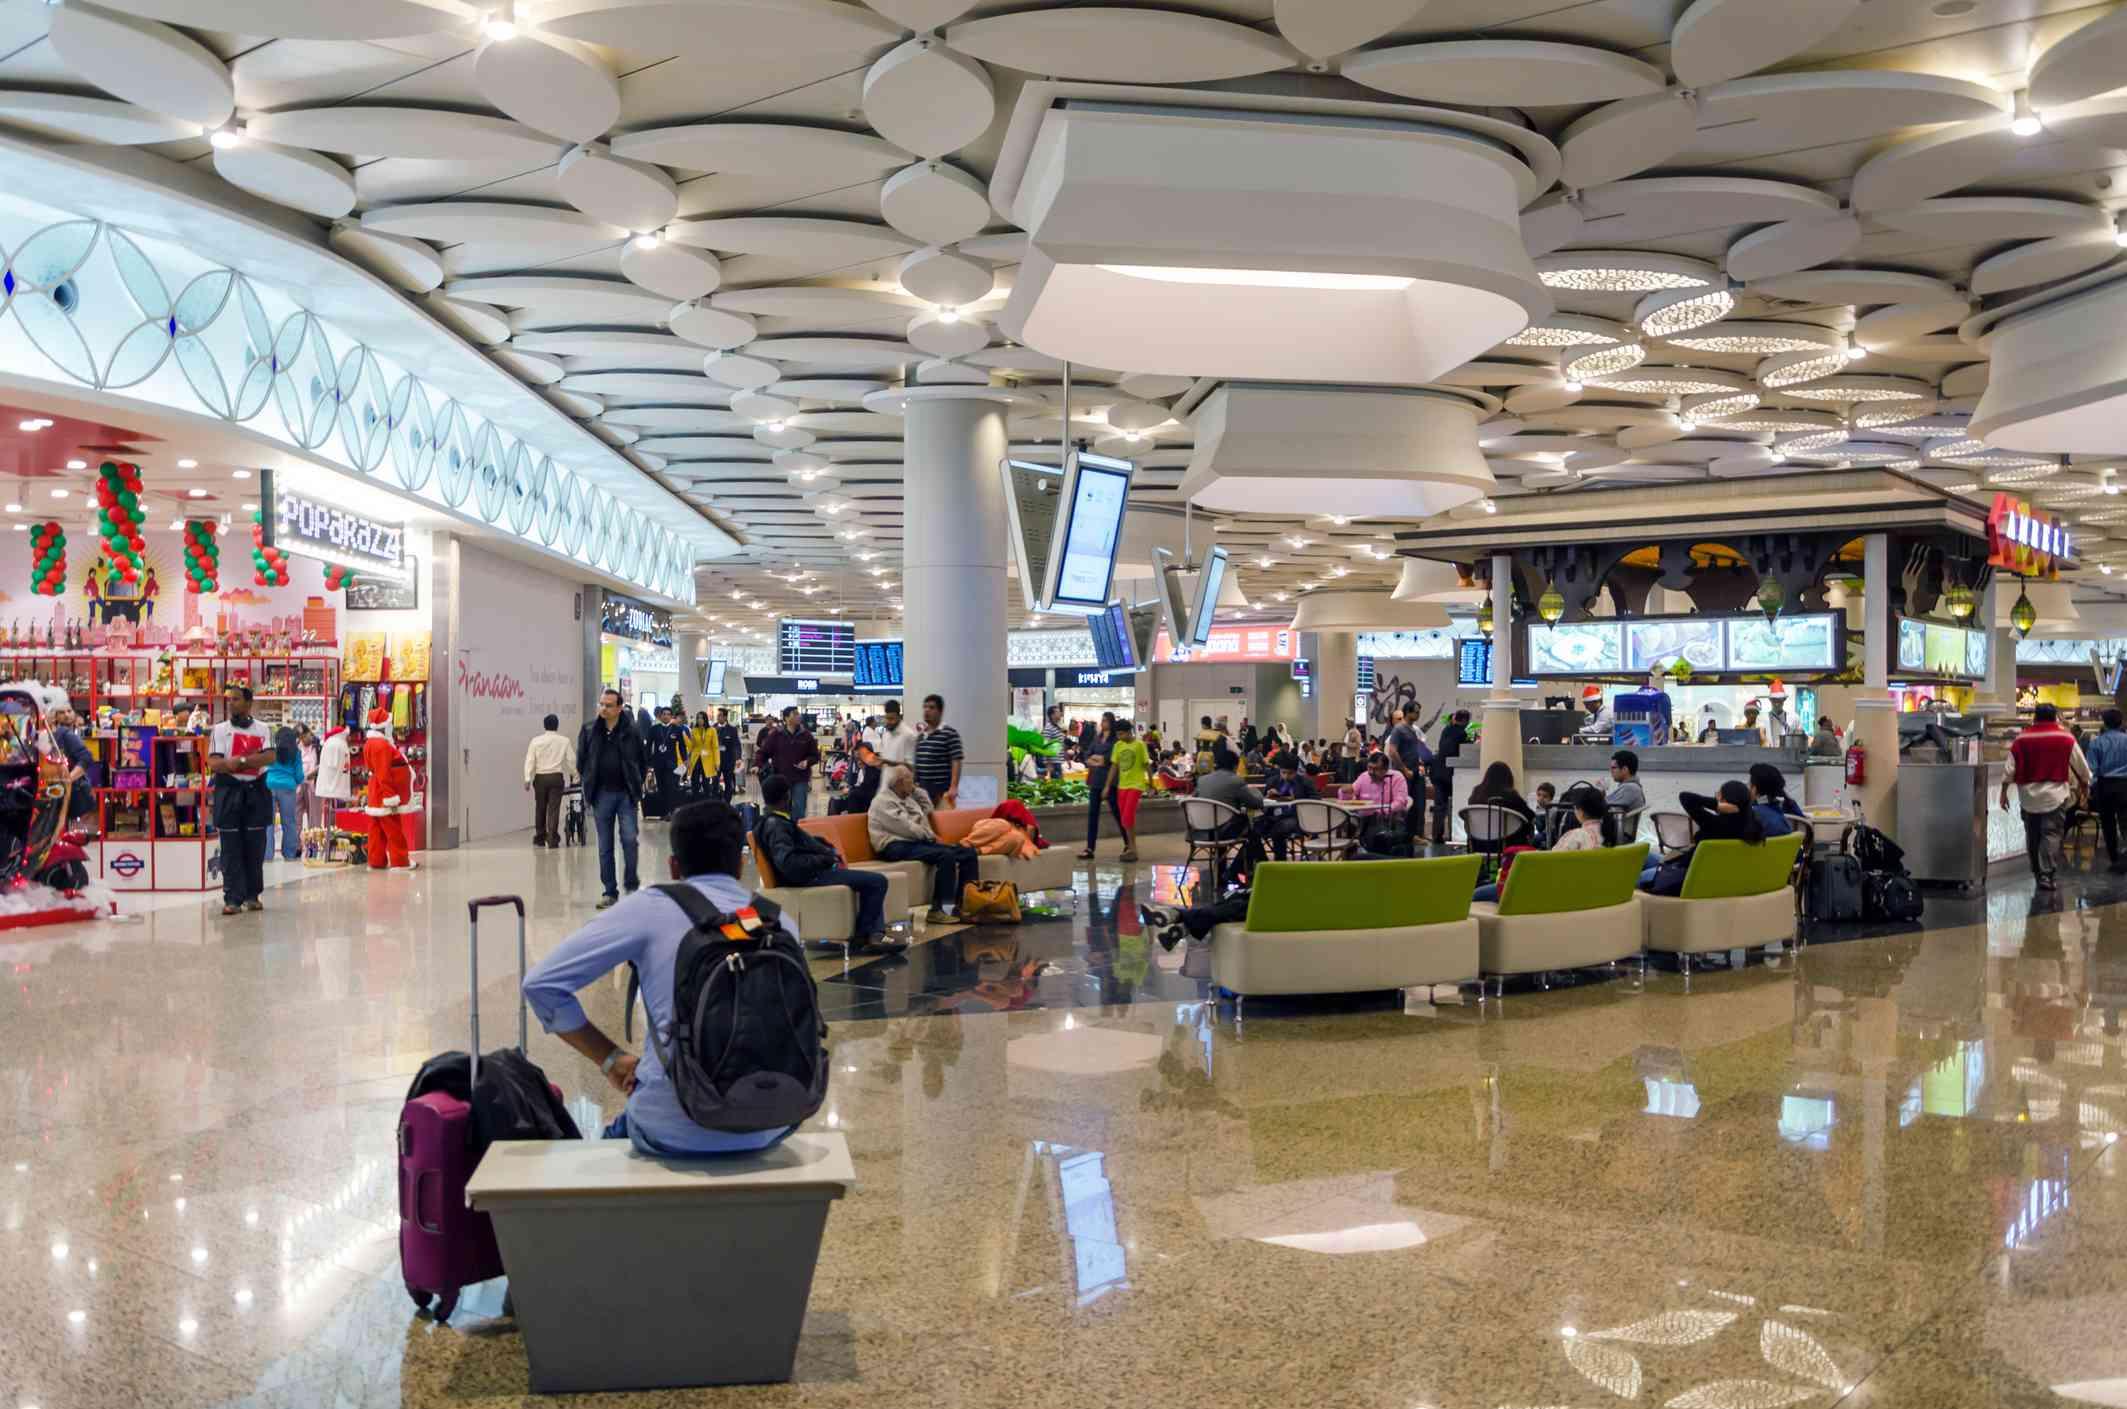 Tourist Shopping at Duty free zone in Chhatrapati Shivaji Airport, Mumbai.